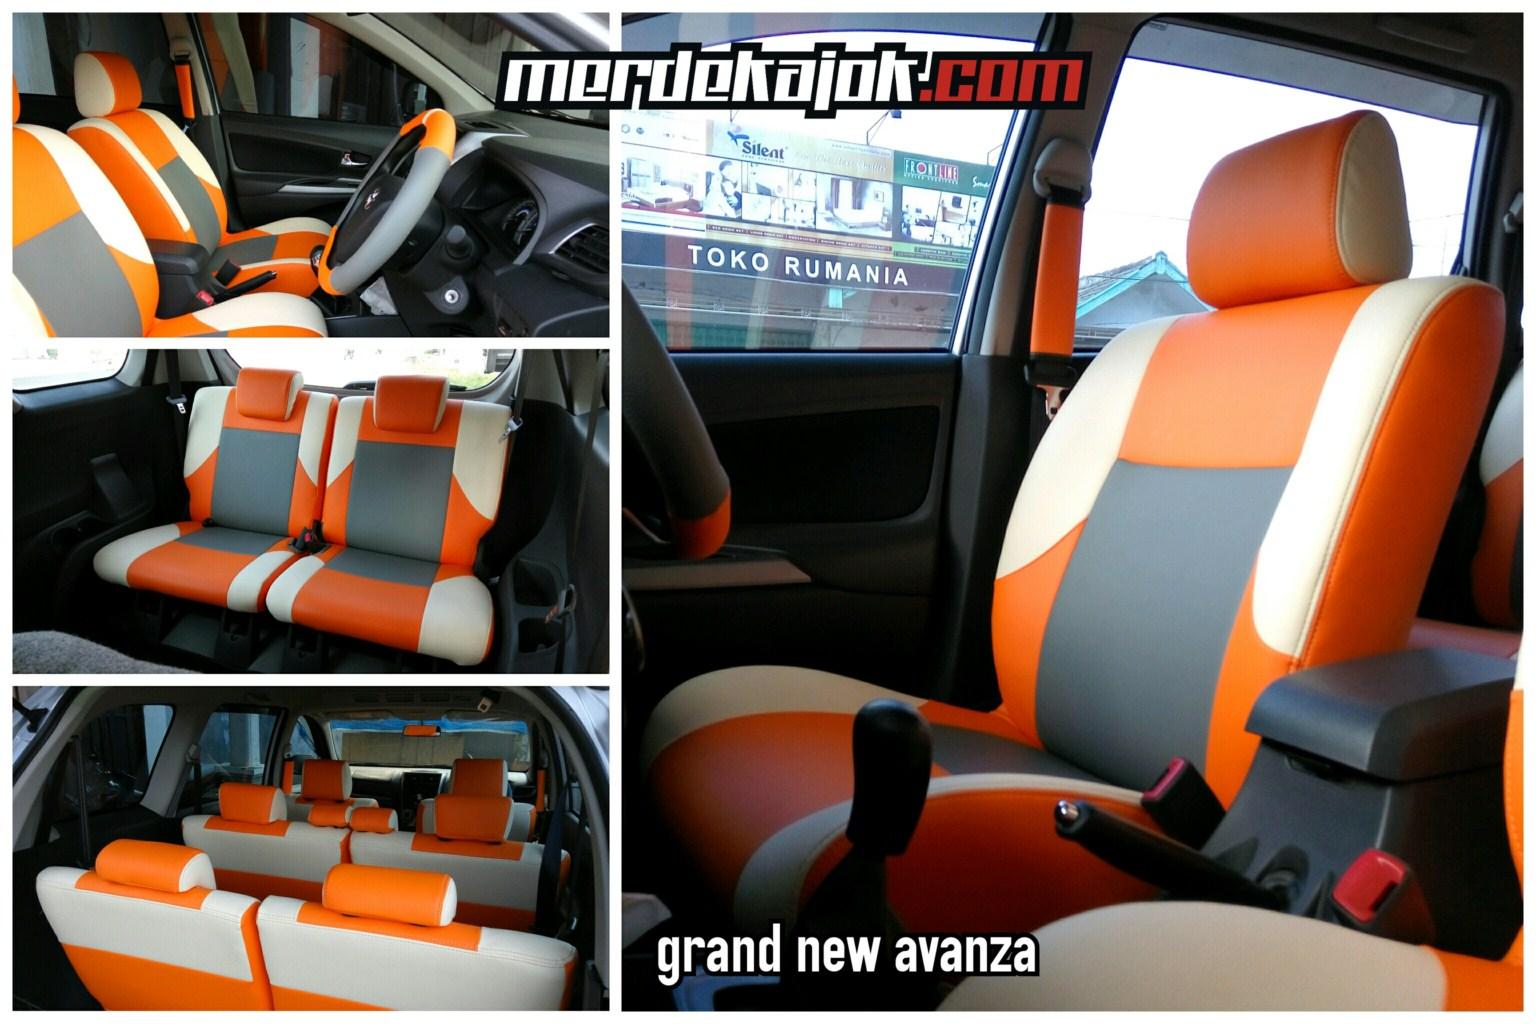 Jok Grand New Avanza Cover Spion Mobil Malang Merdekajok Orange Gray Cream